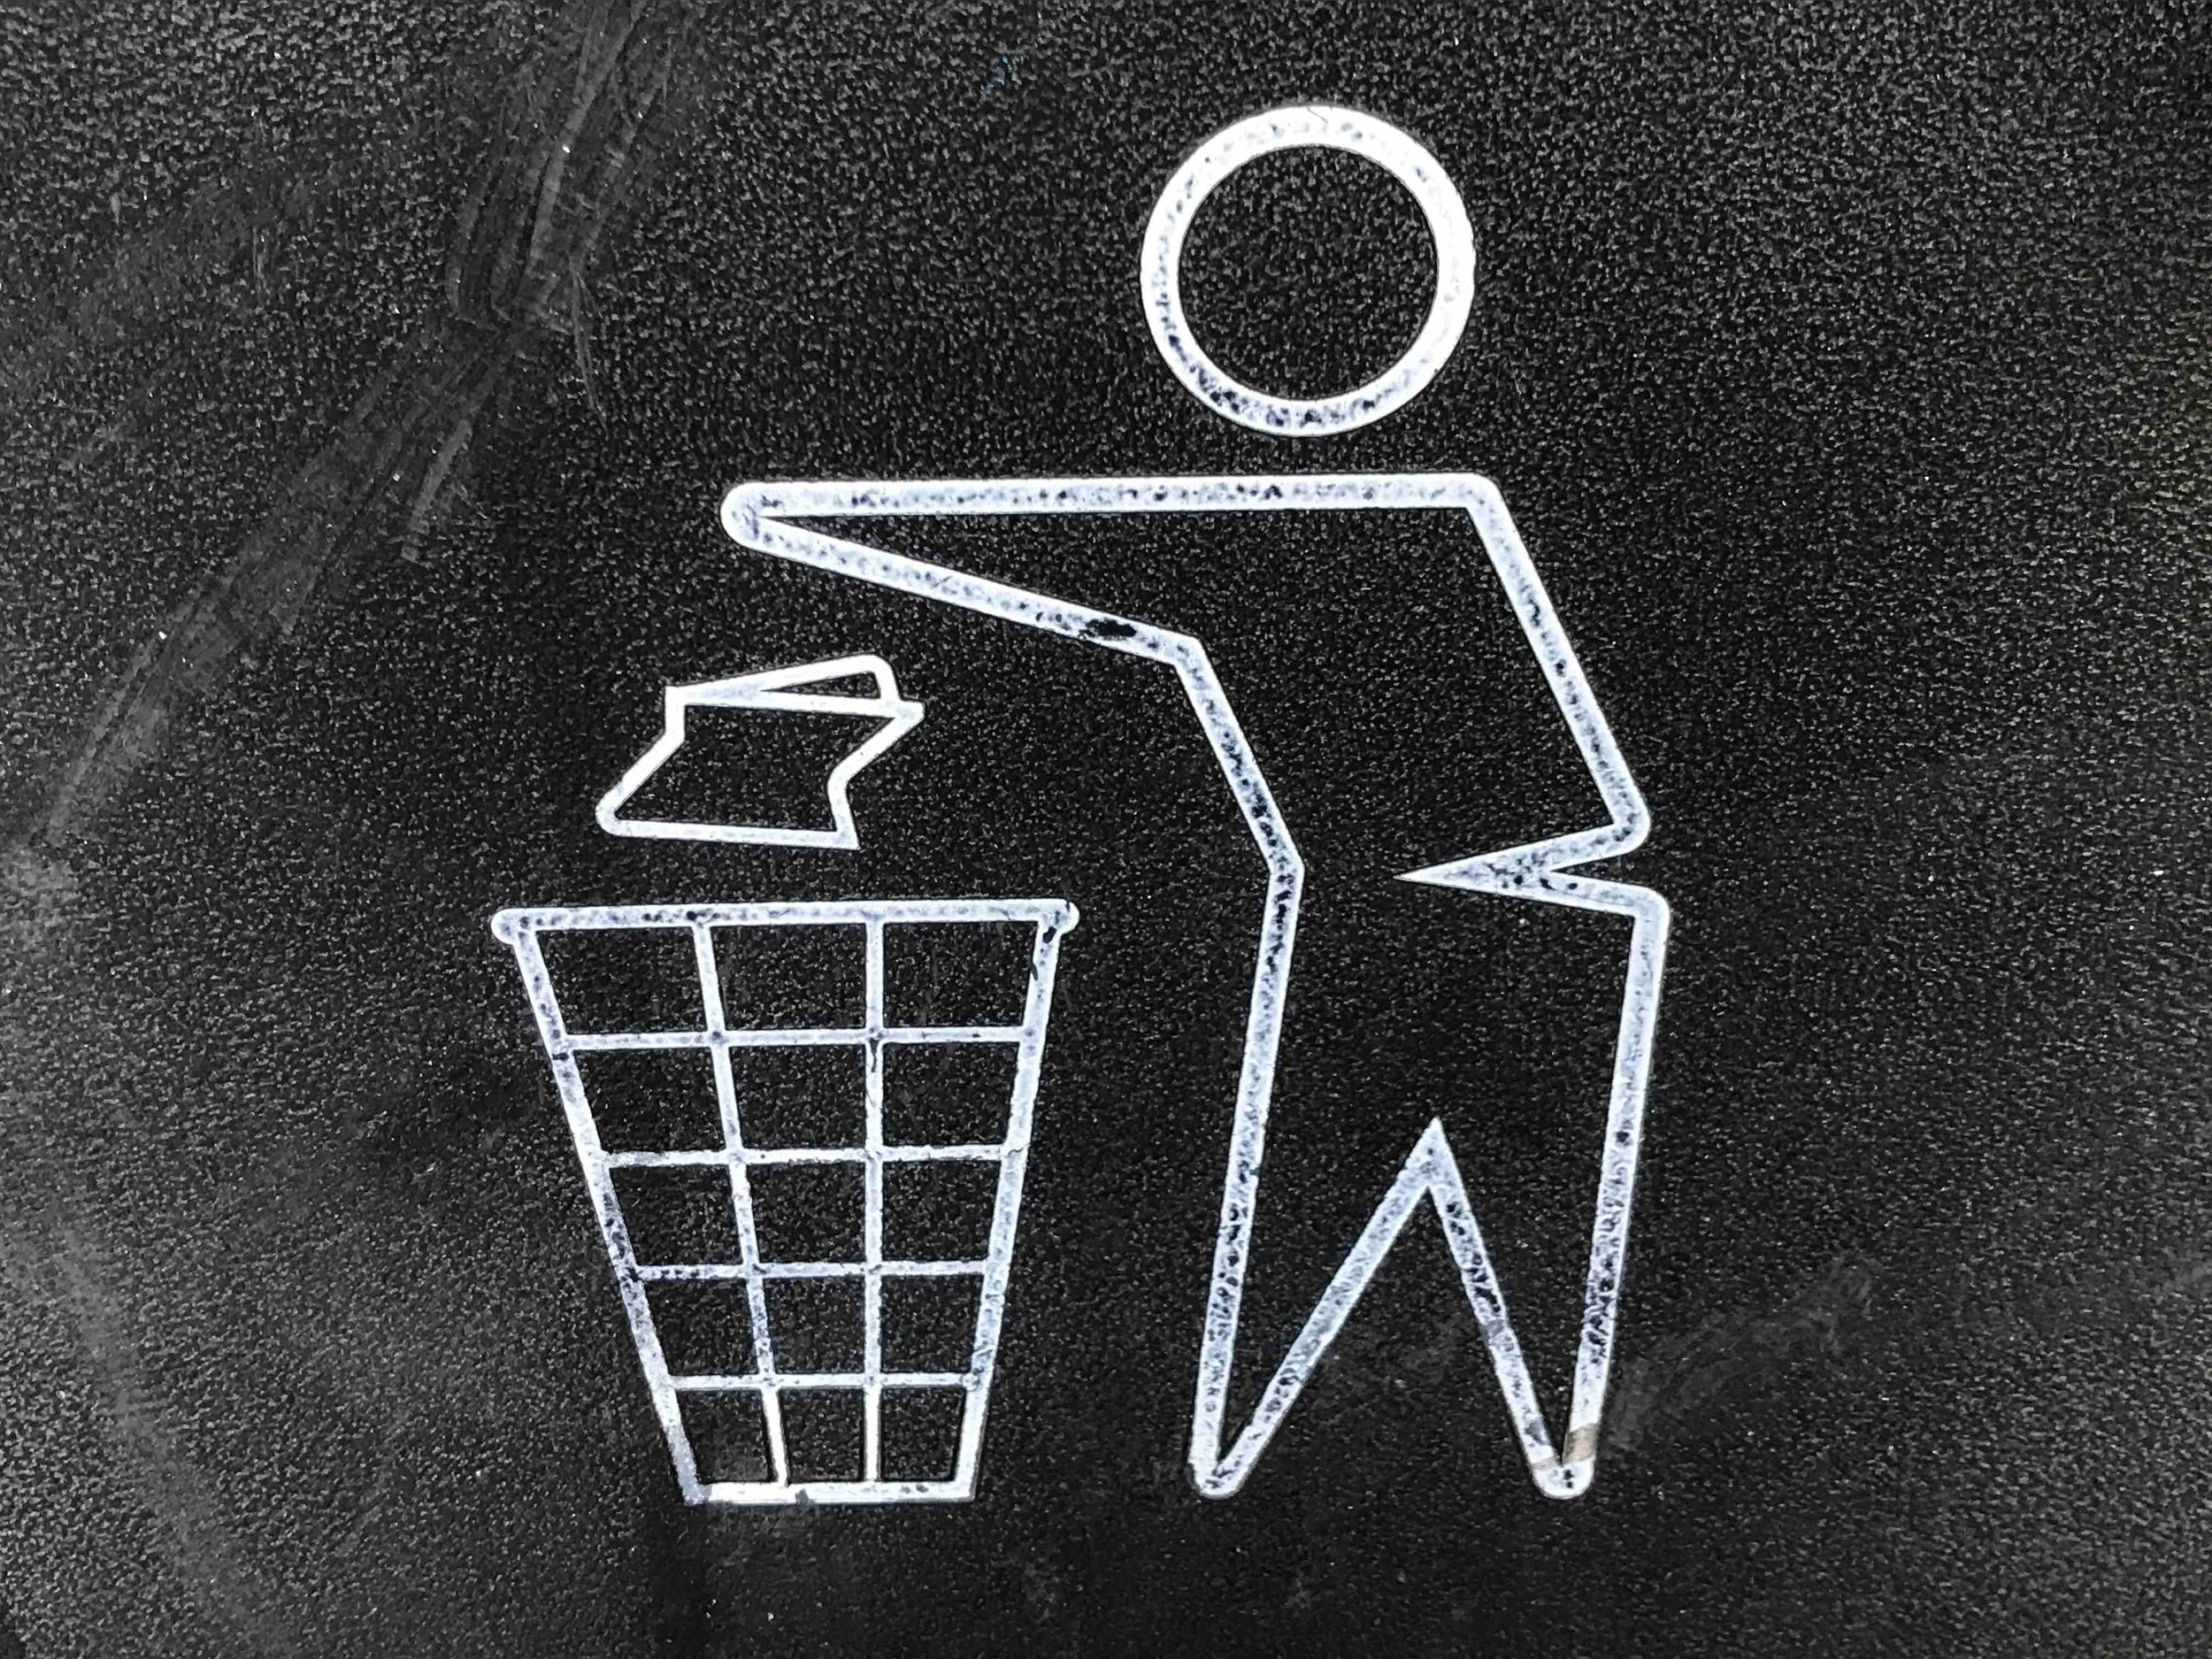 Metro Nashville Solid Waste Master Plan_signage.jpg